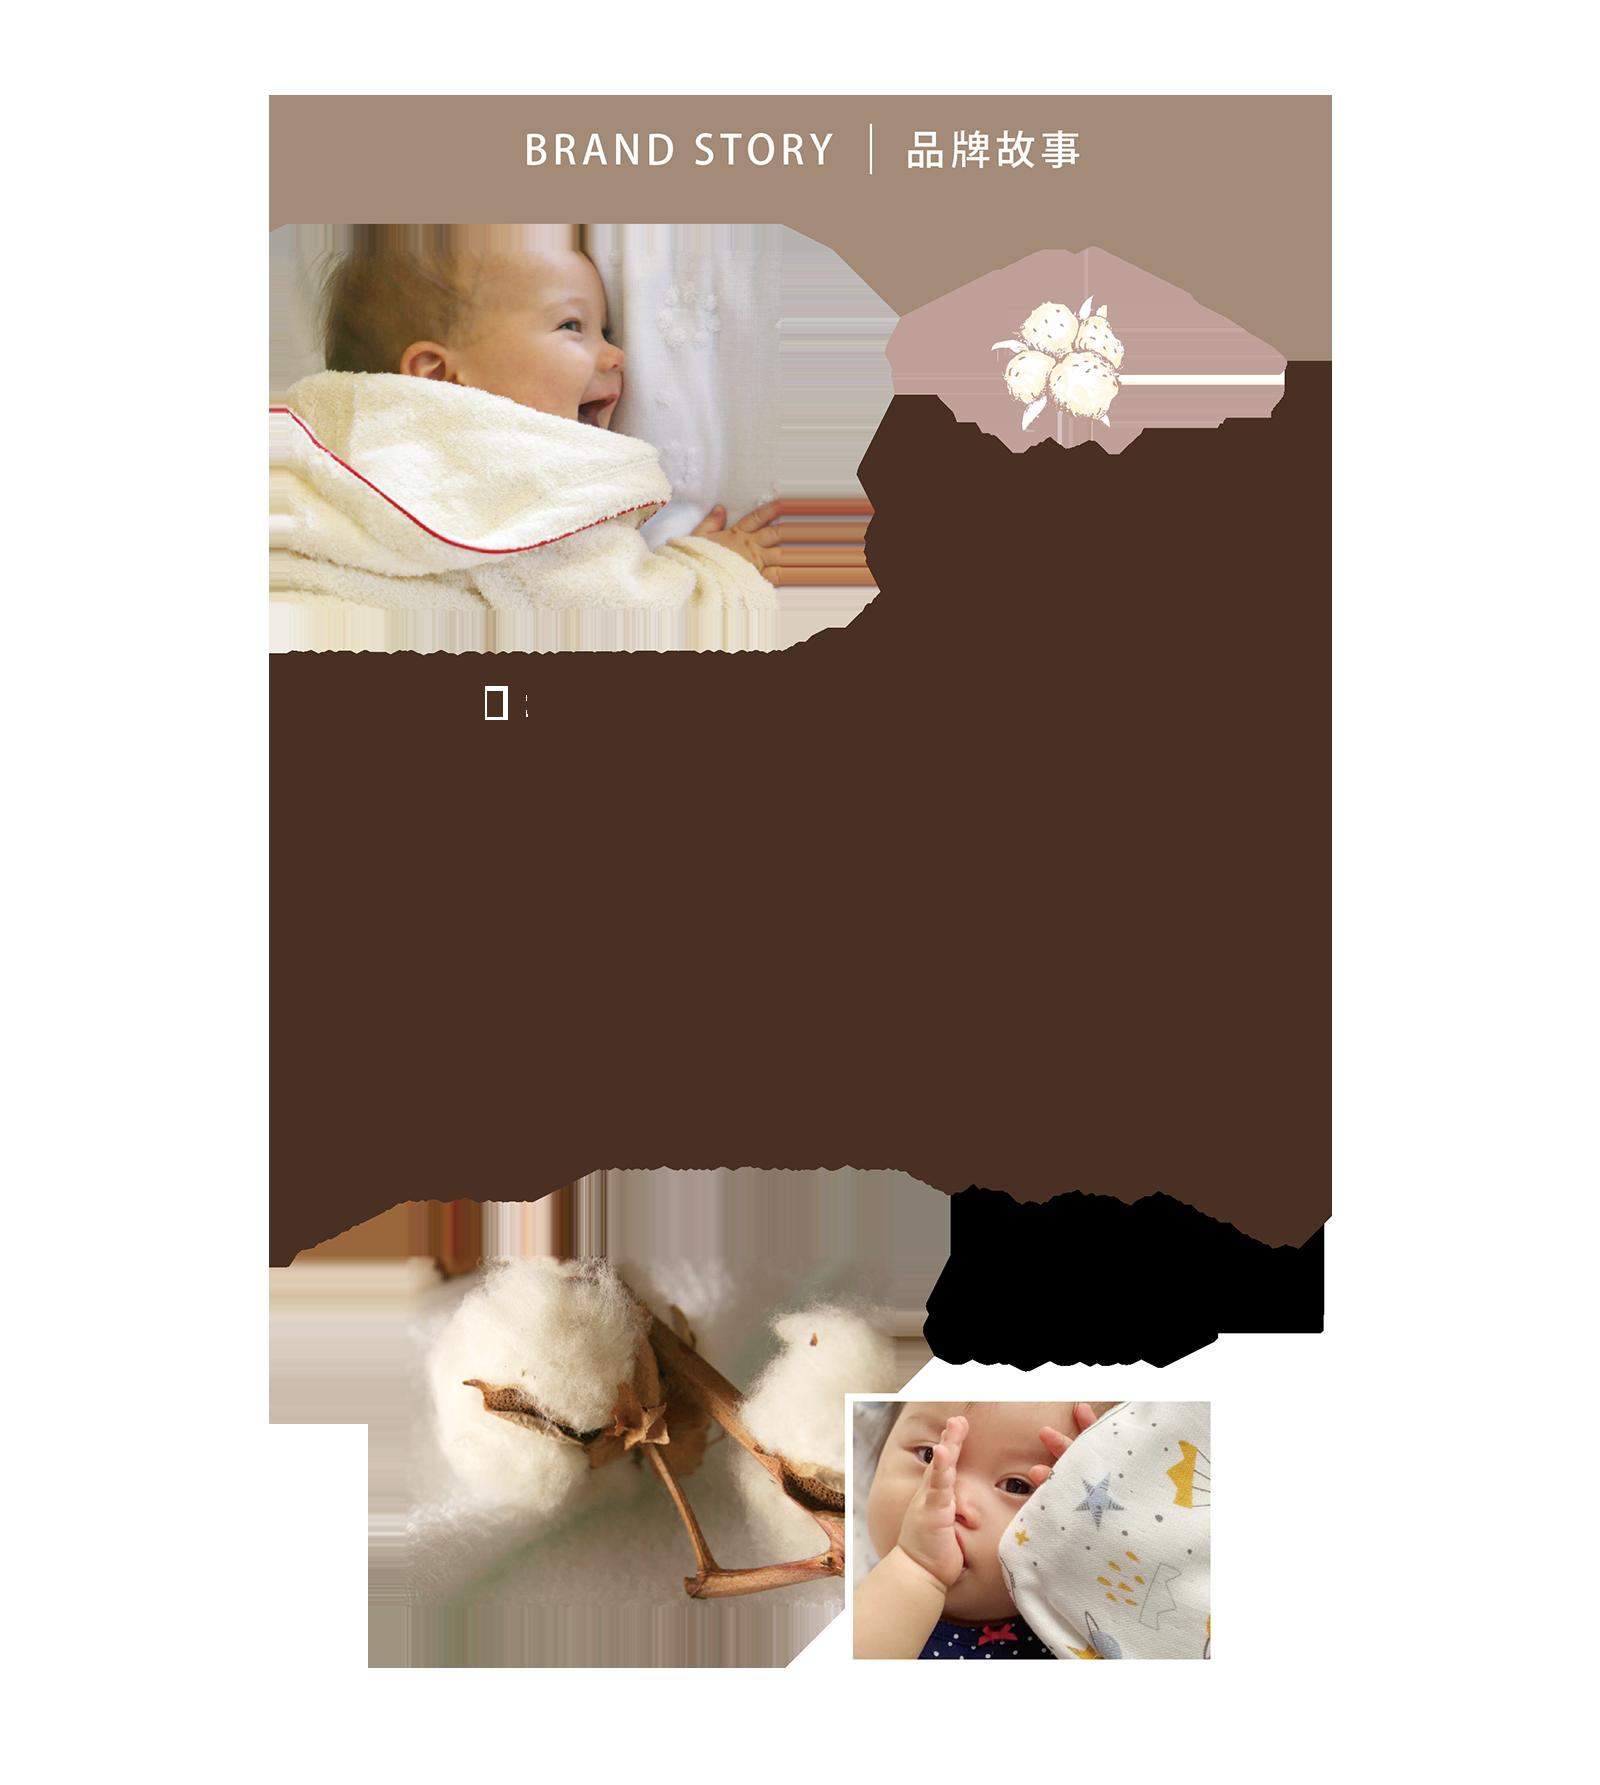 brandstory-品牌故事